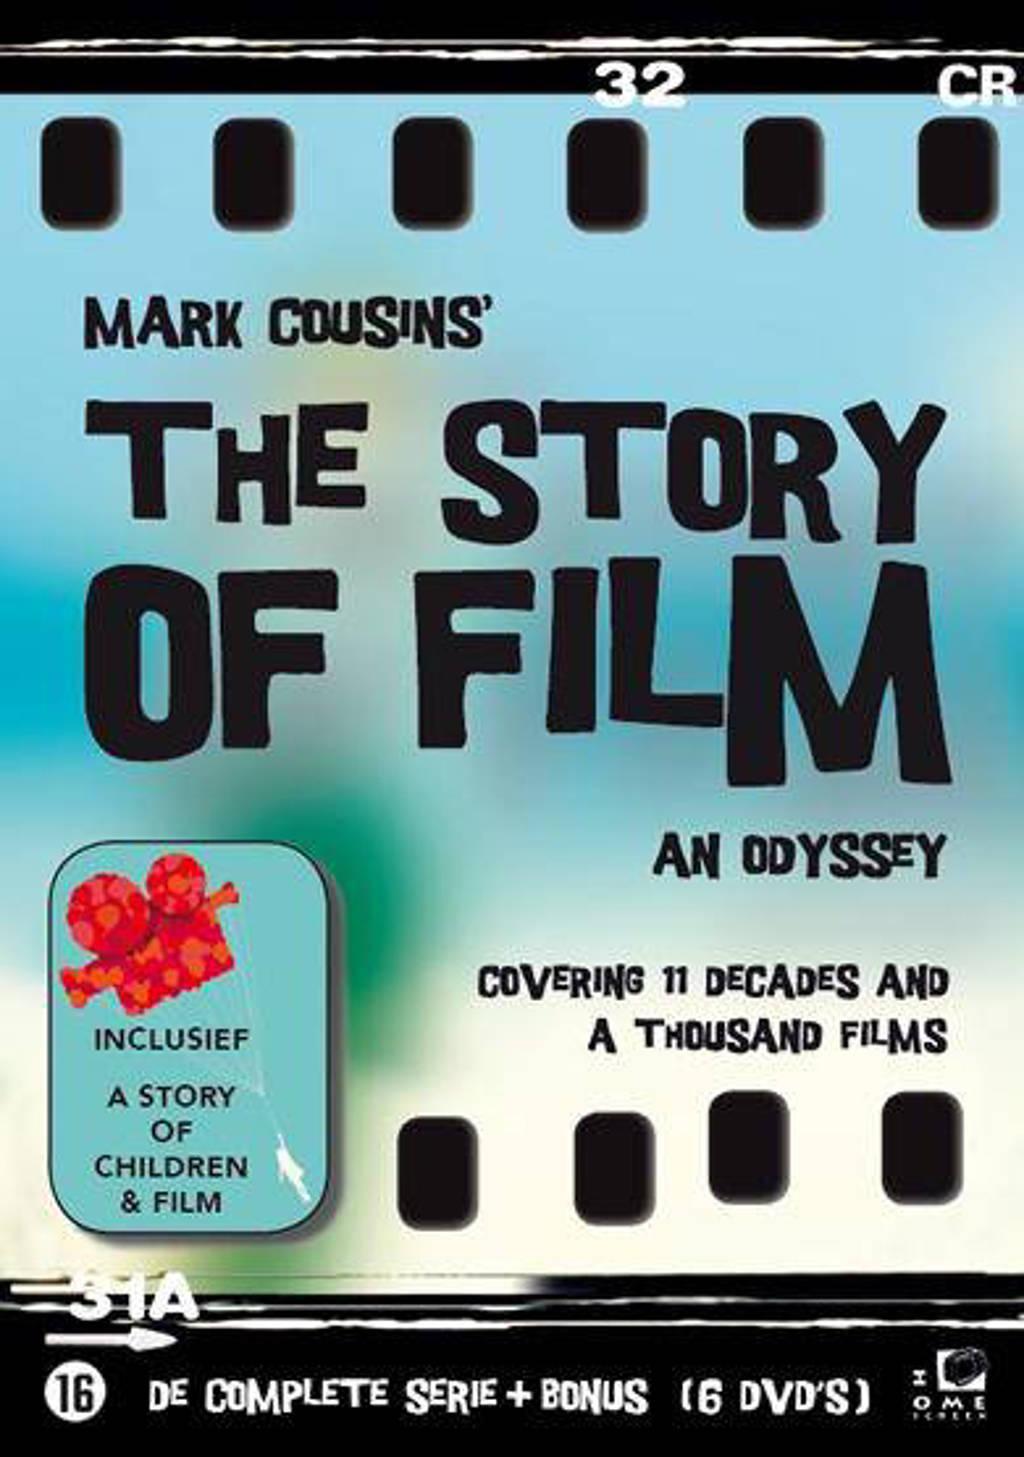 Story of film - An odyssey (DVD)